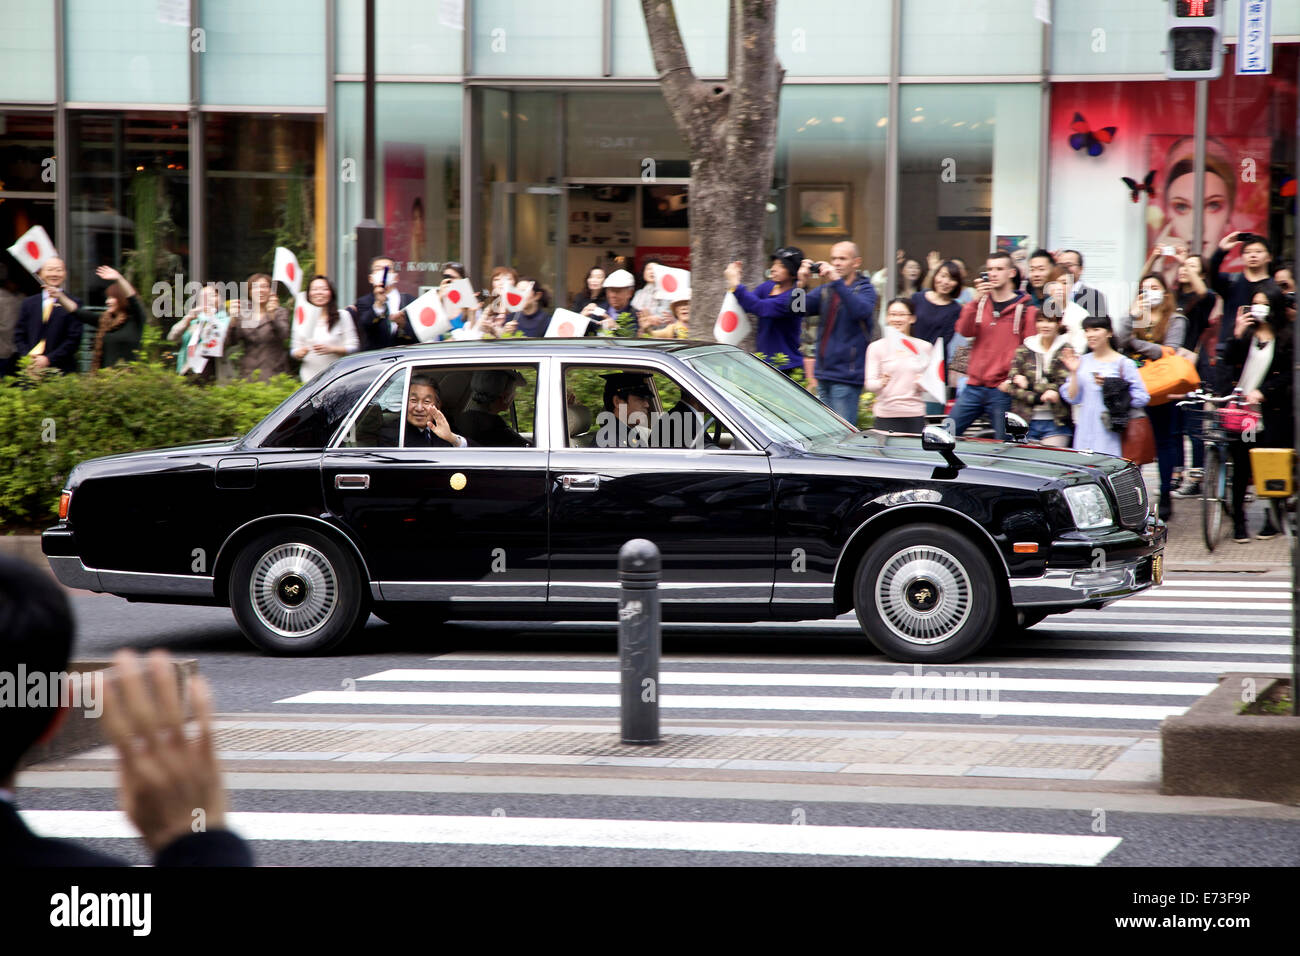 Japanese emperor Akihito in car, Omote-sando, Harajuku area, Tokyo, Japan, Asia Stock Photo